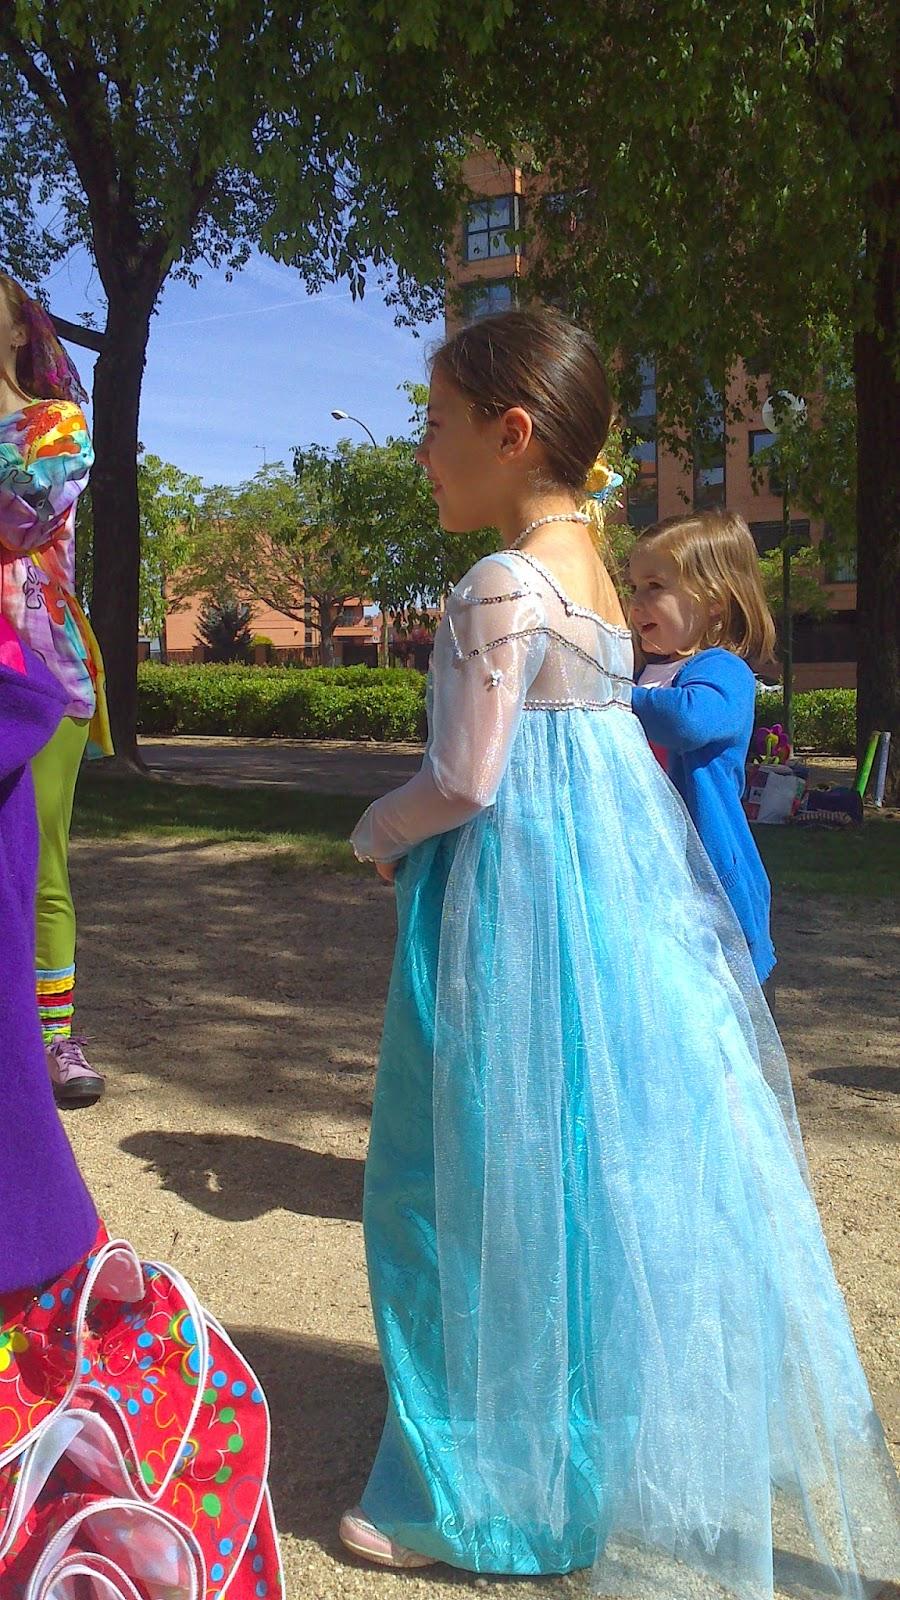 La costura de Nicoleta: Disfraz de Elsa de Frozen